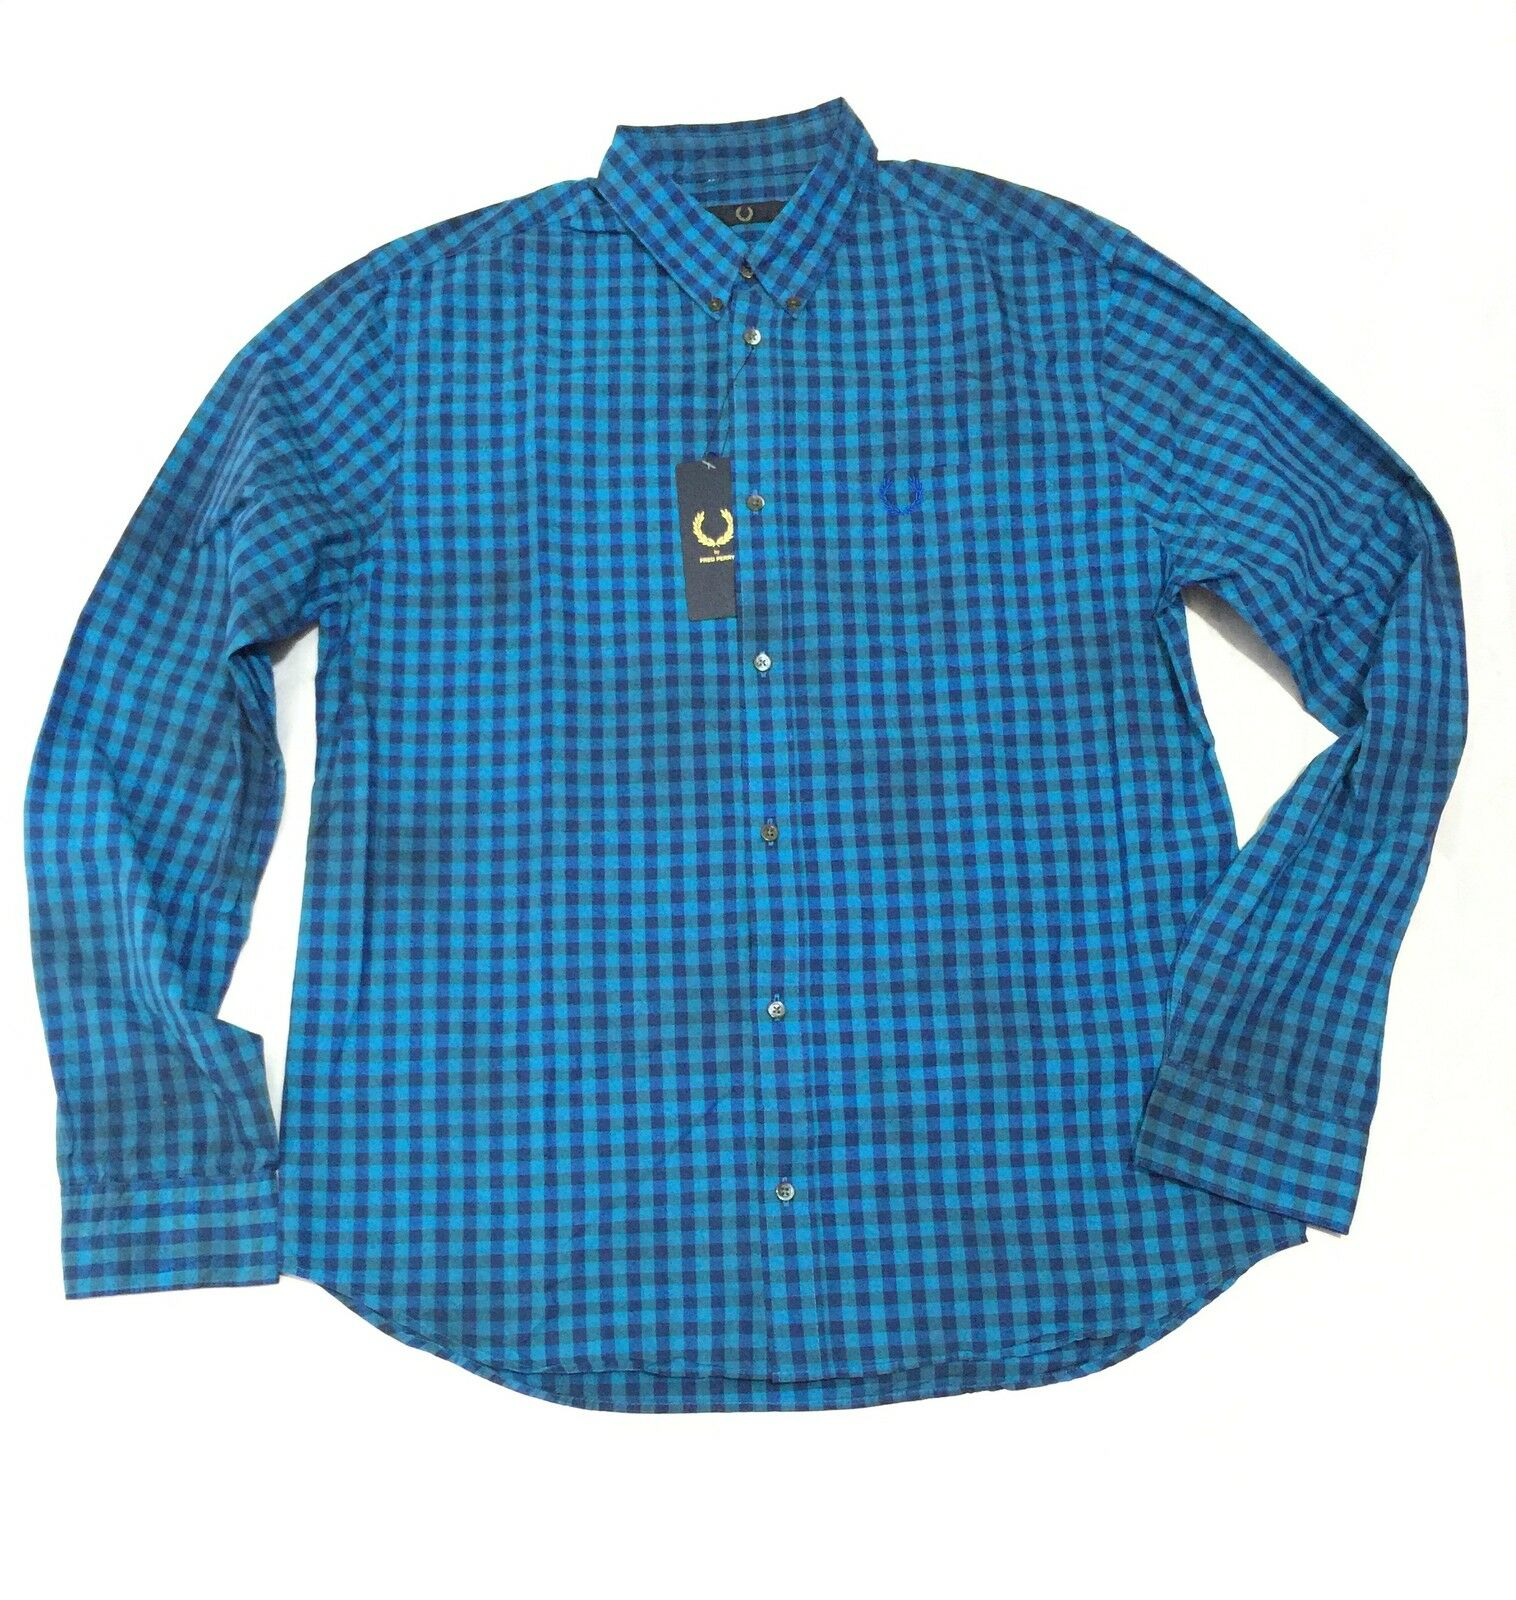 Fred Perry Tie Dye Men's Long Sleeve Shirt M5158-201